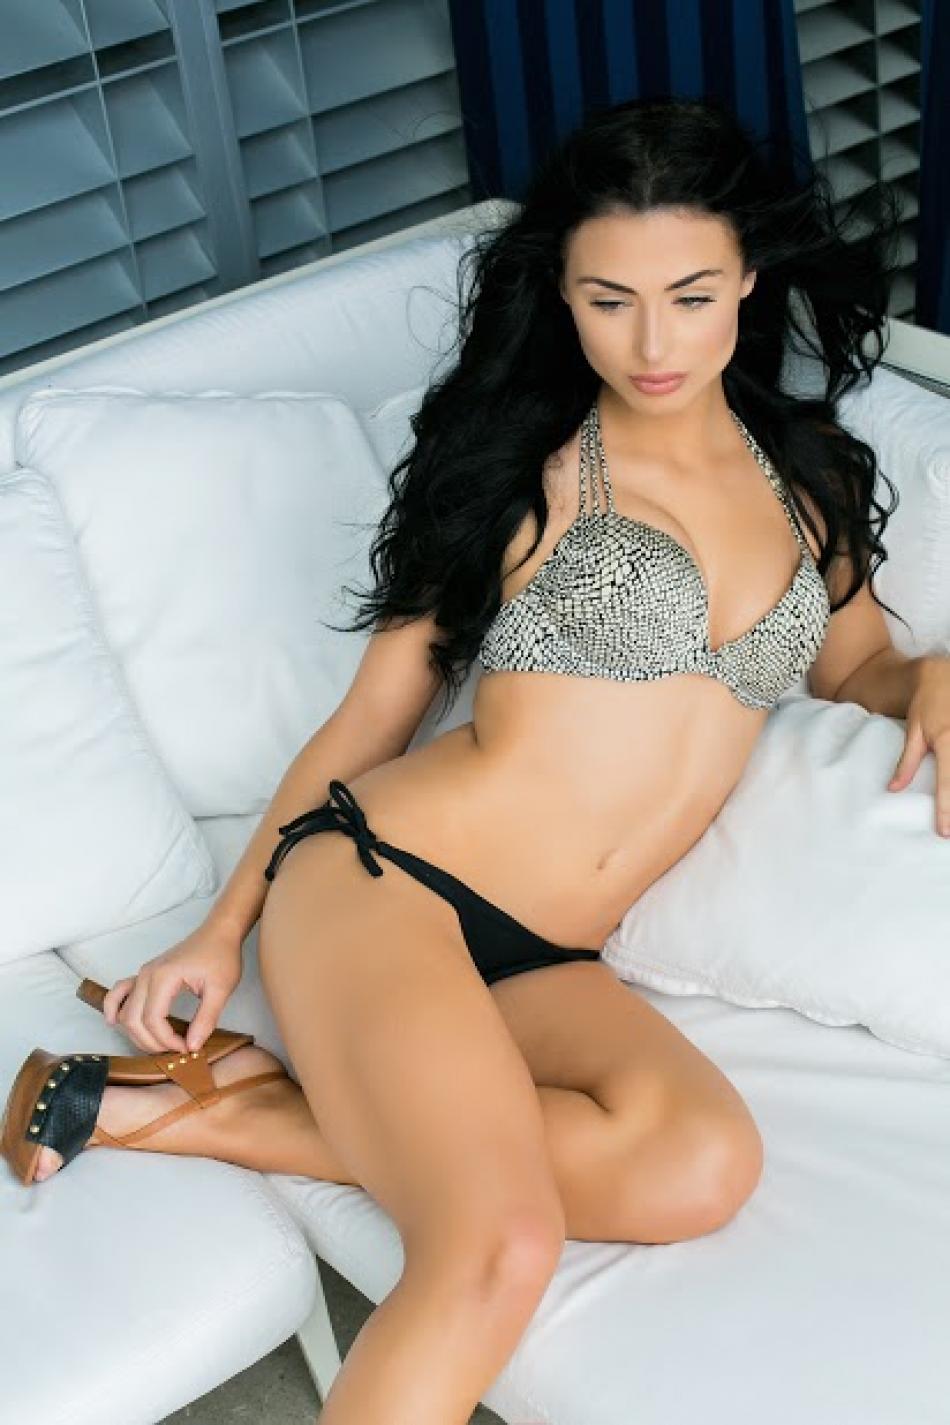 Ladyfordaddy.com Natali Girl In New York 29111132 - 1 1